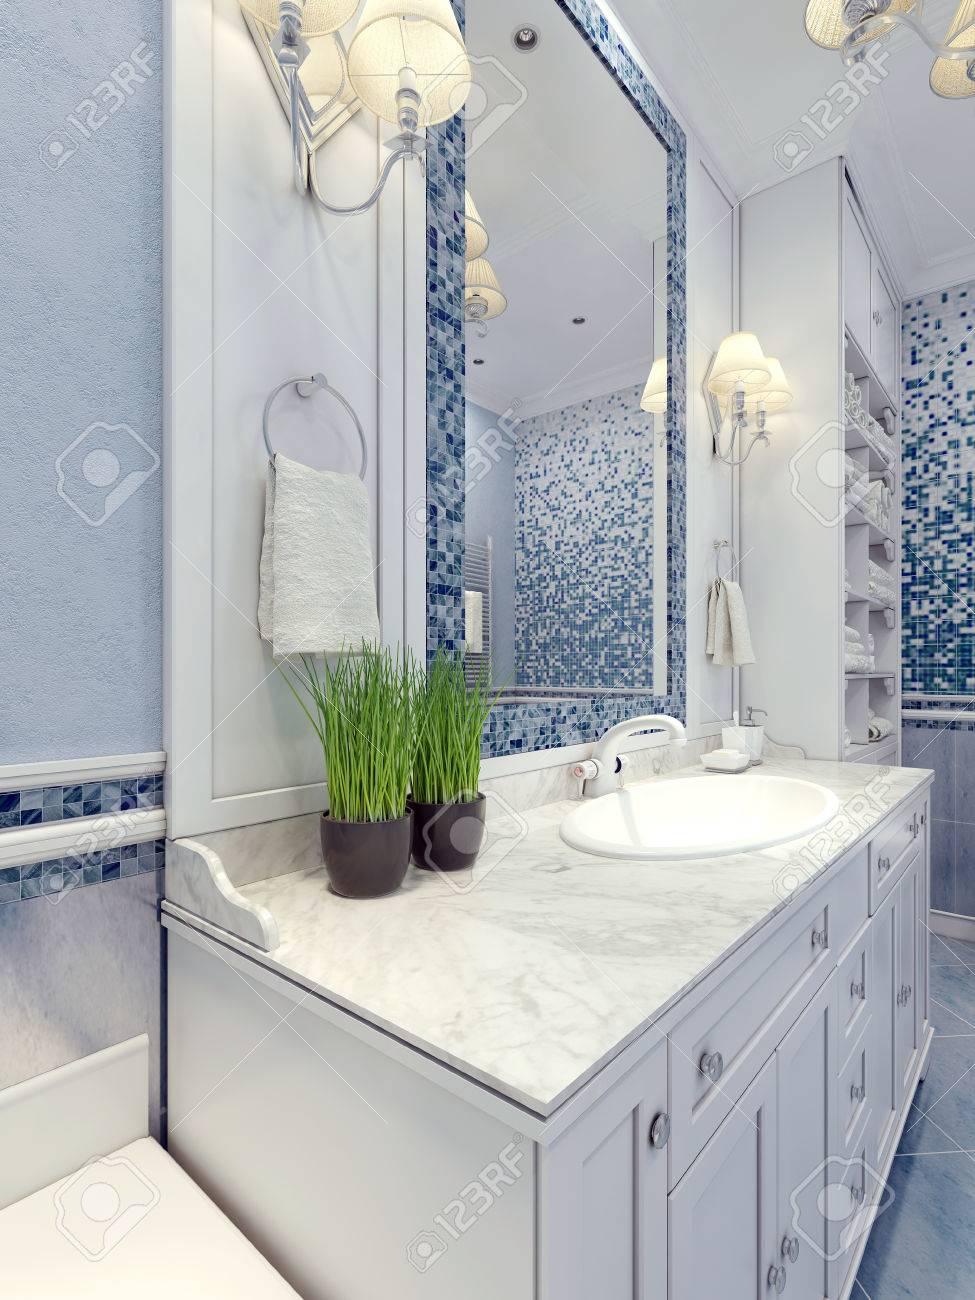 15 Hermoso Muebles De Ba O Azul Galer A De Im Genes Muebles De  # Muebles Gema Bogota